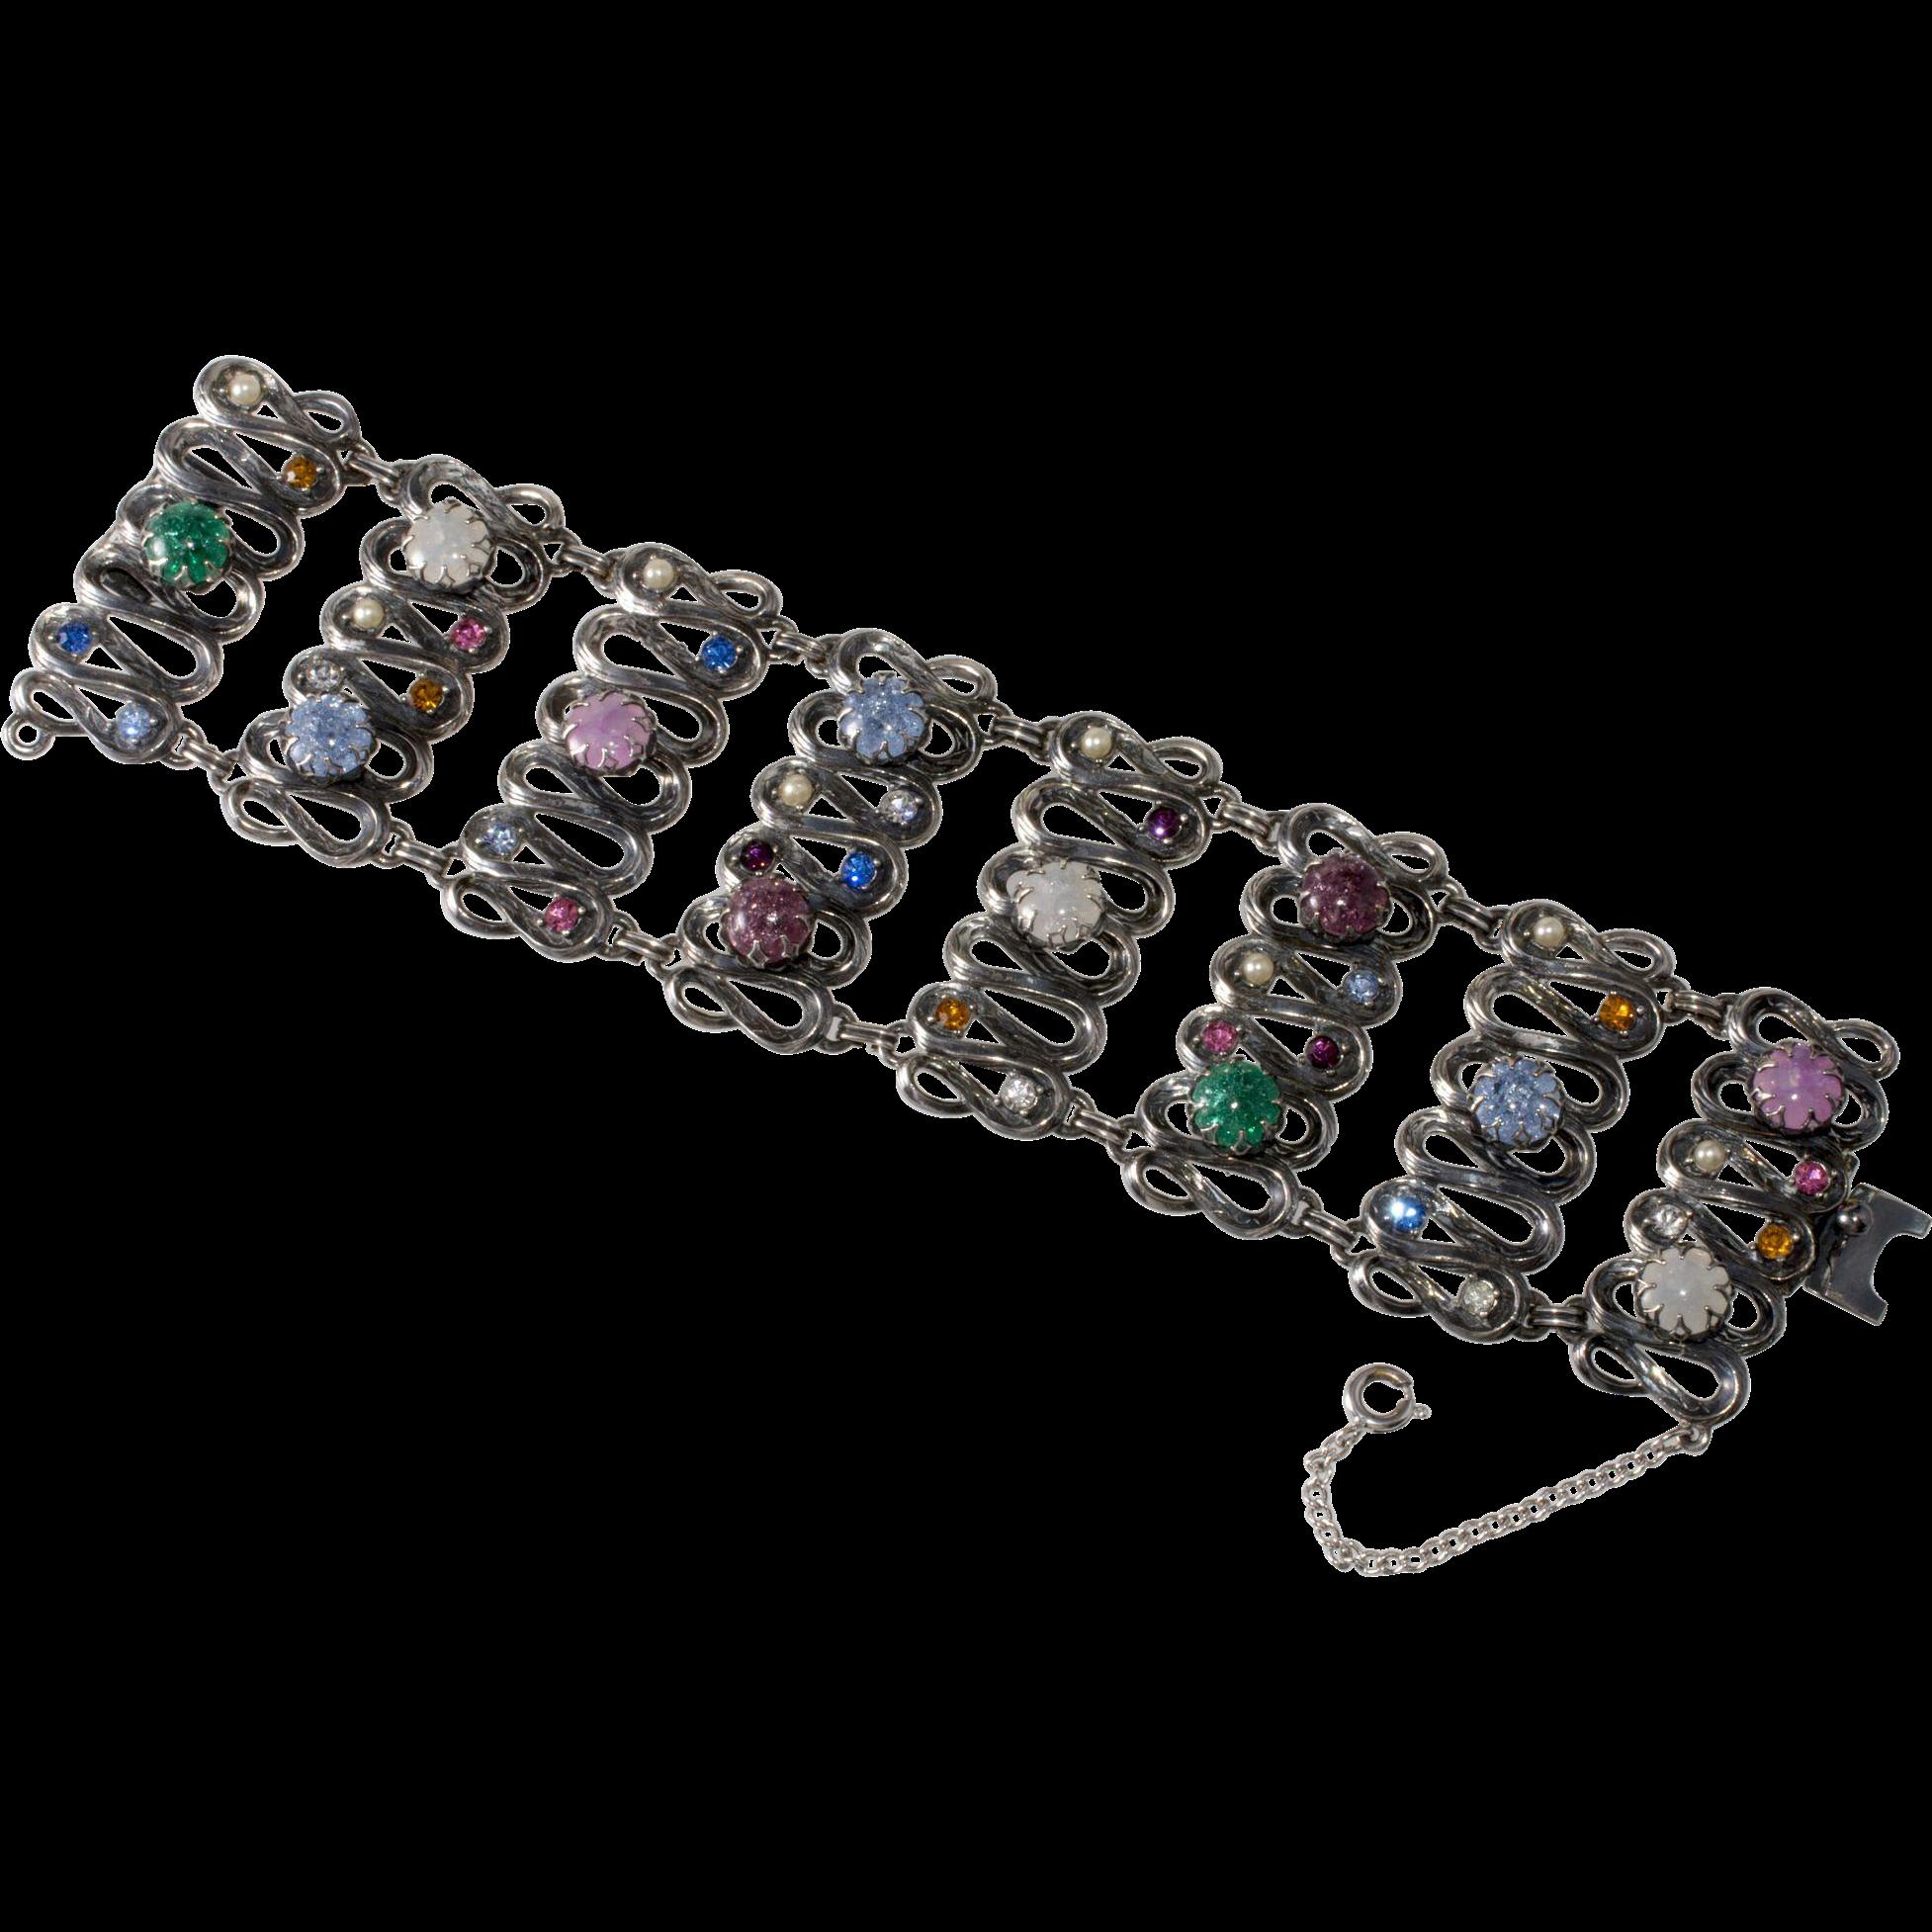 Schiaparelli WIDE Multi-Color Crackle Glass Rhinestone